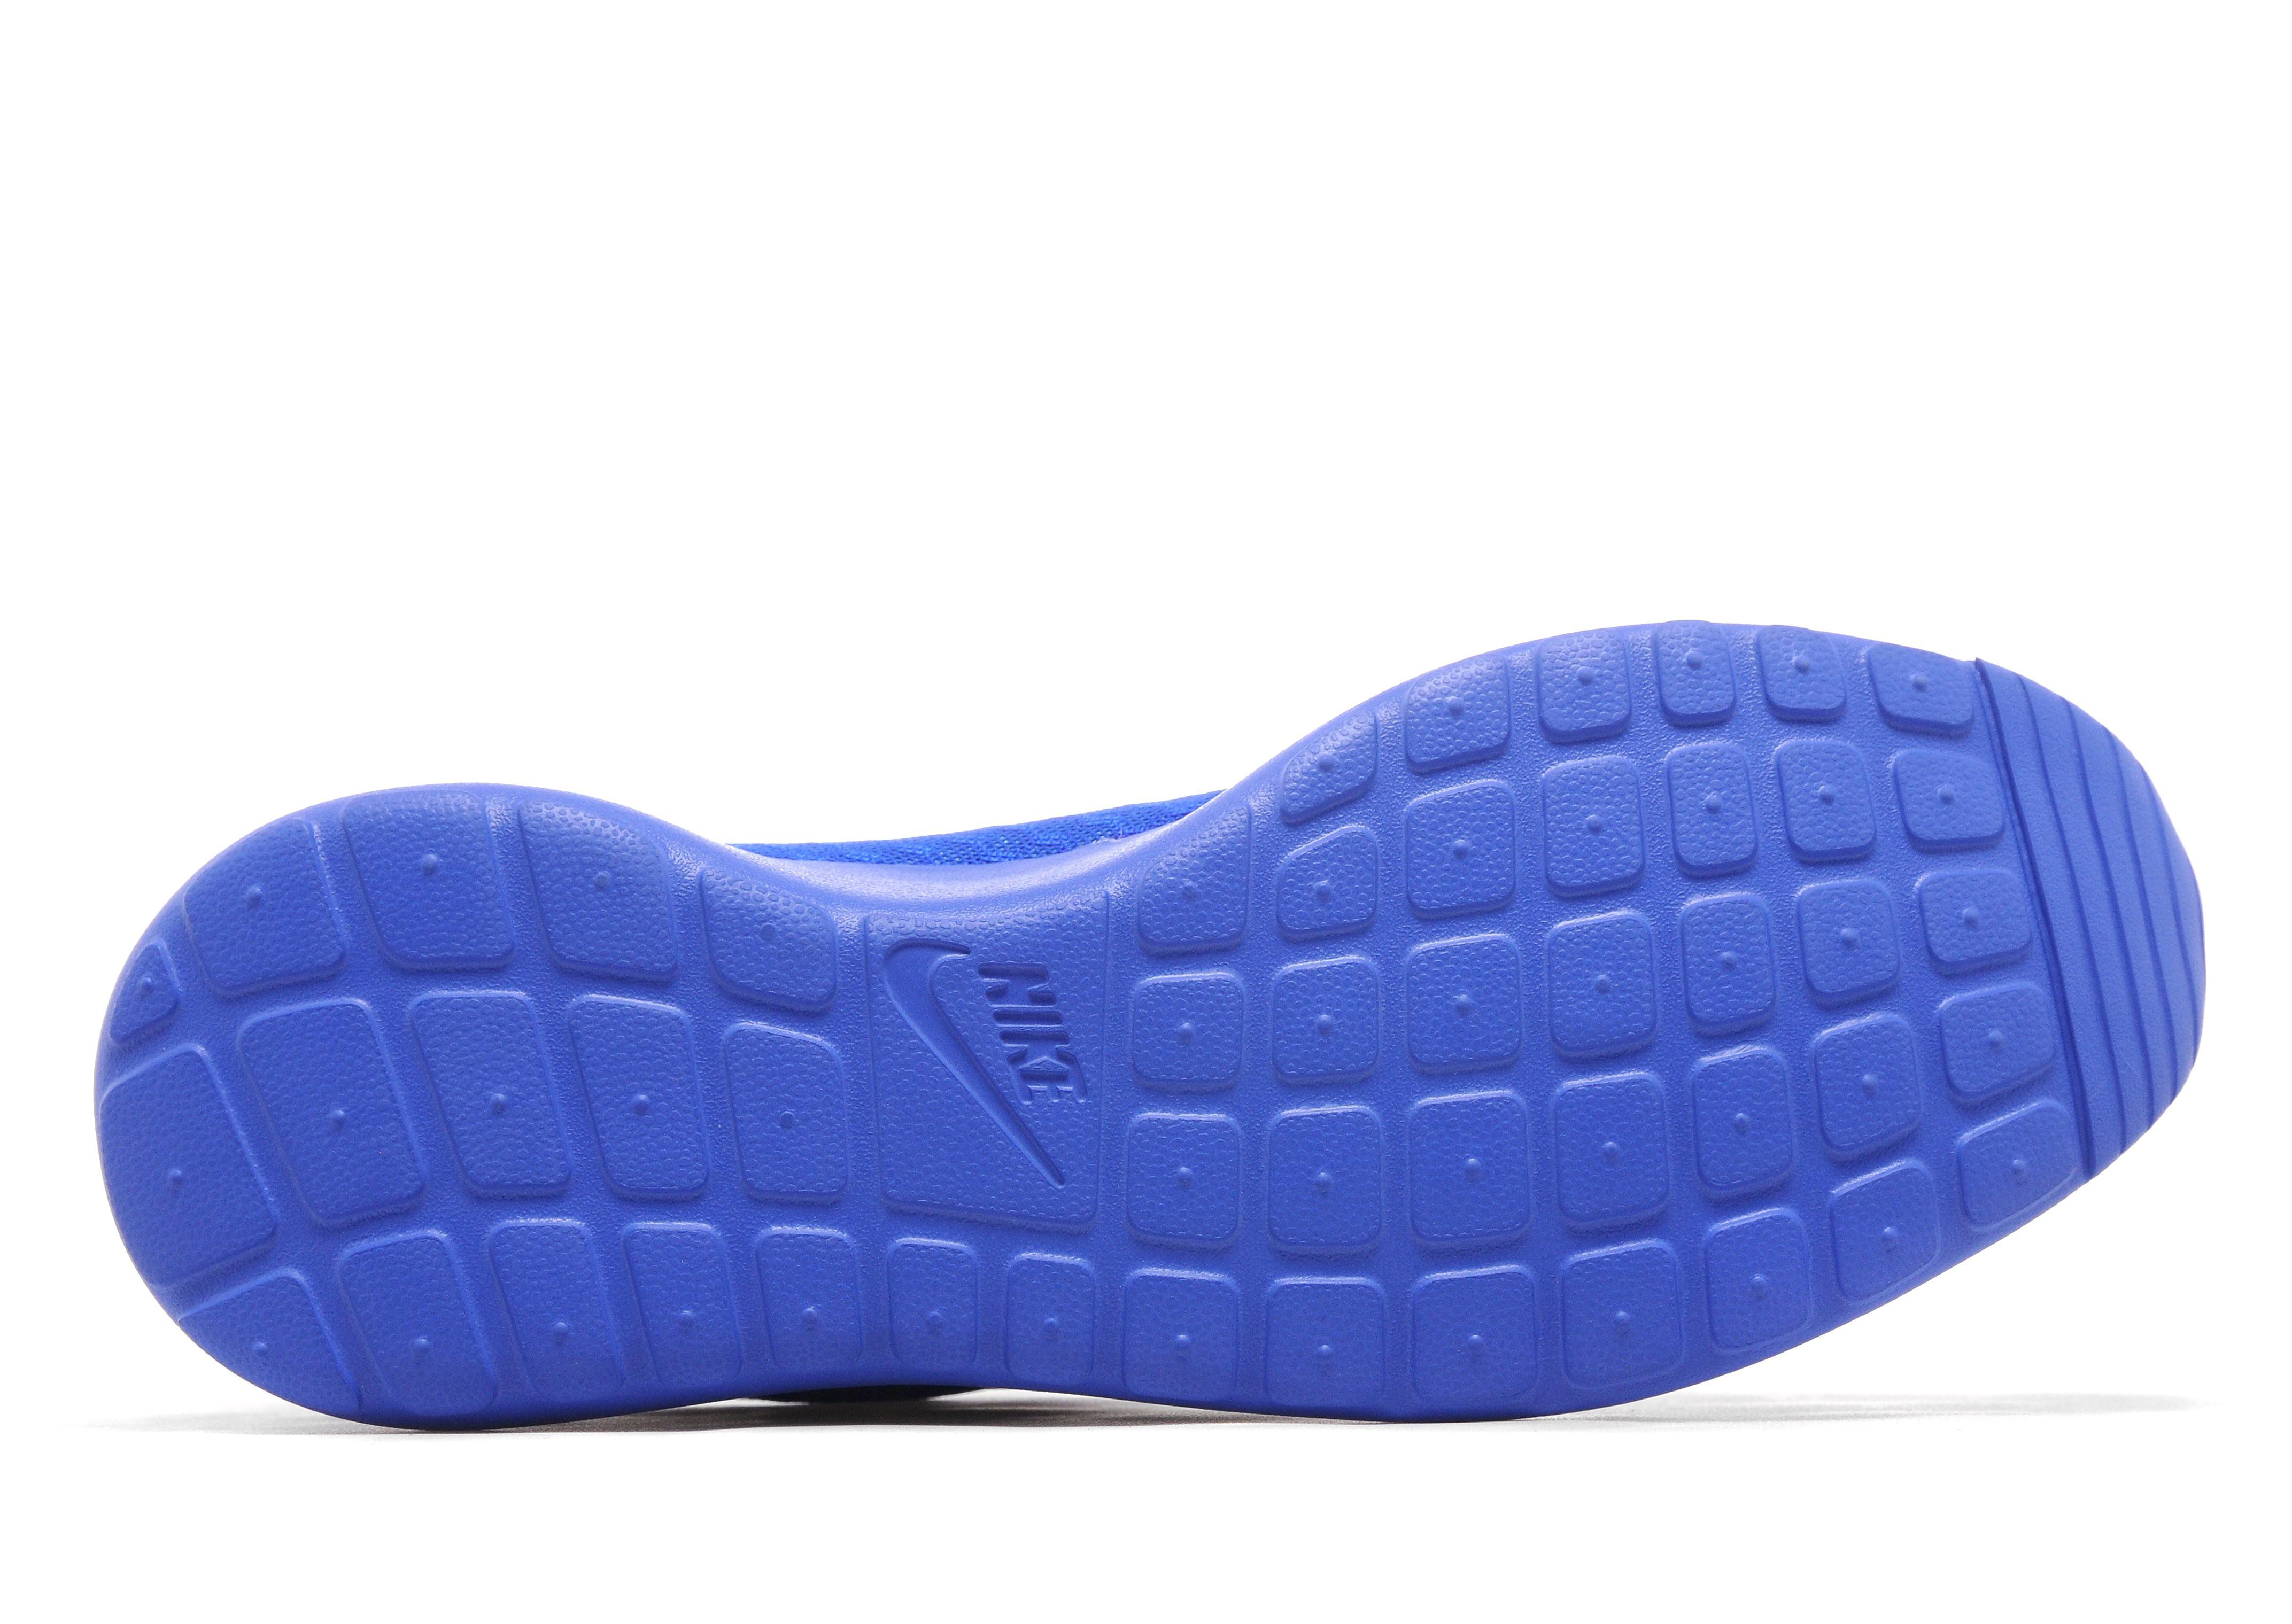 Nike Roshe One Hyperfuse